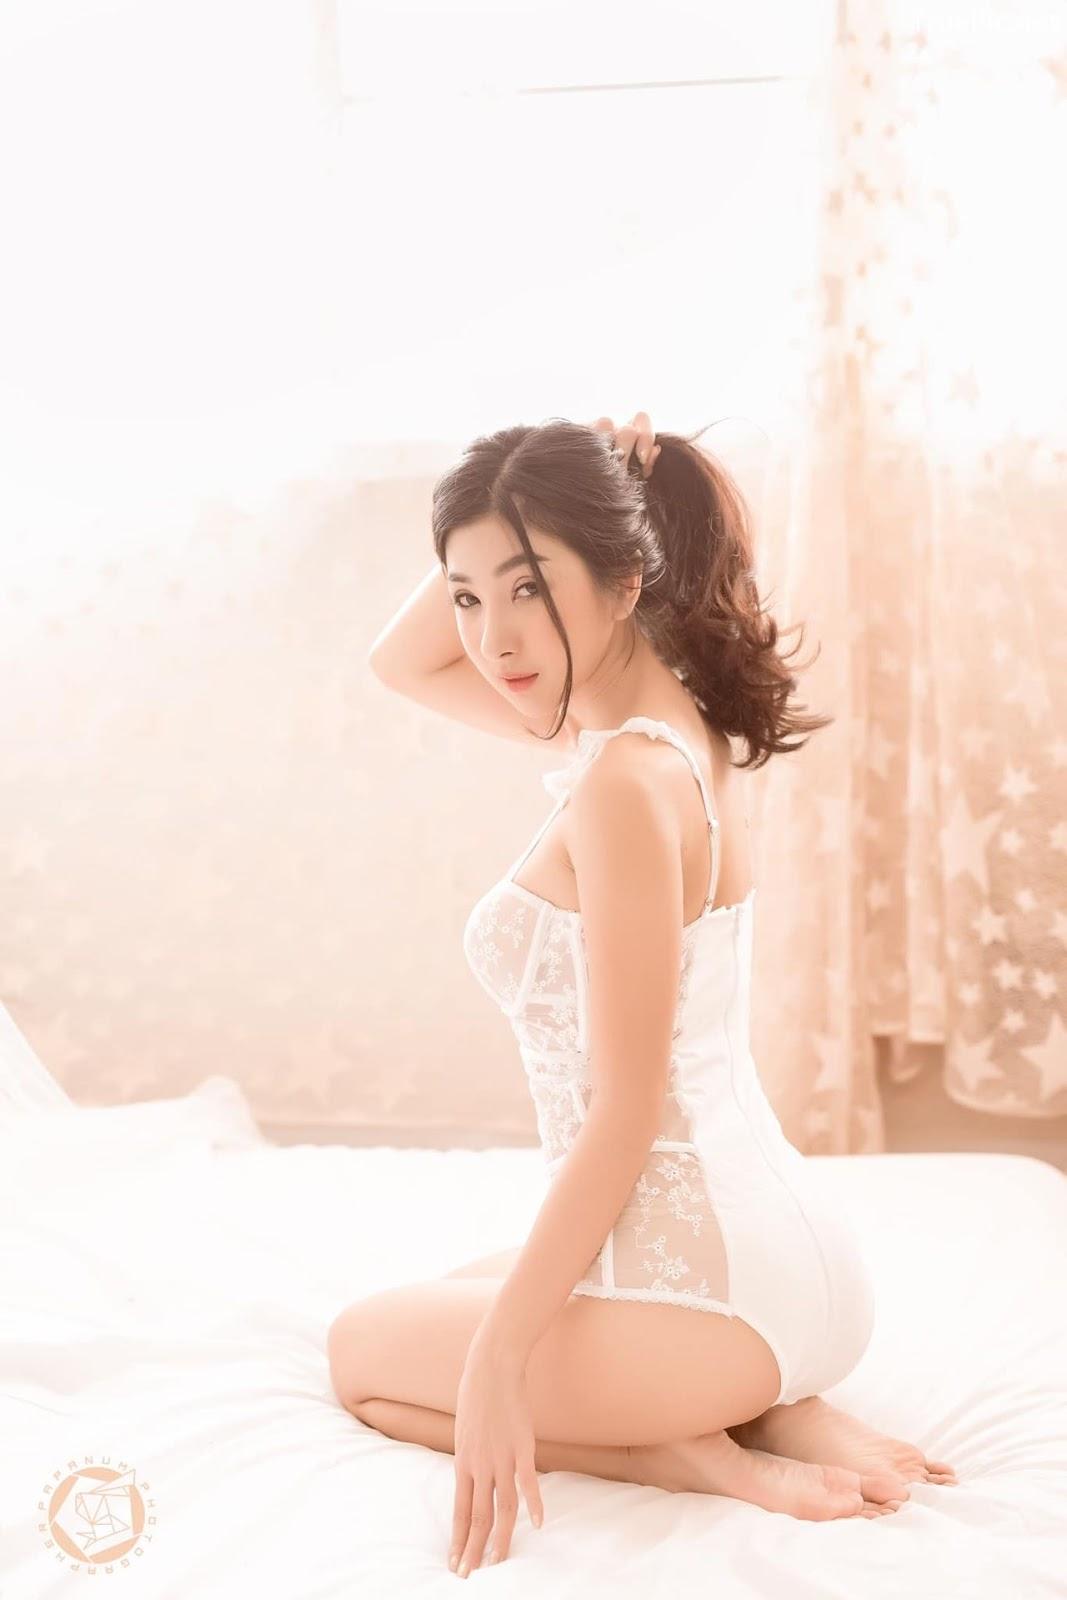 Image-Thailand-Sexy-Model-Pattamaporn-Keawkum-White-Transparent-Lingerie-TruePic.net- Picture-6